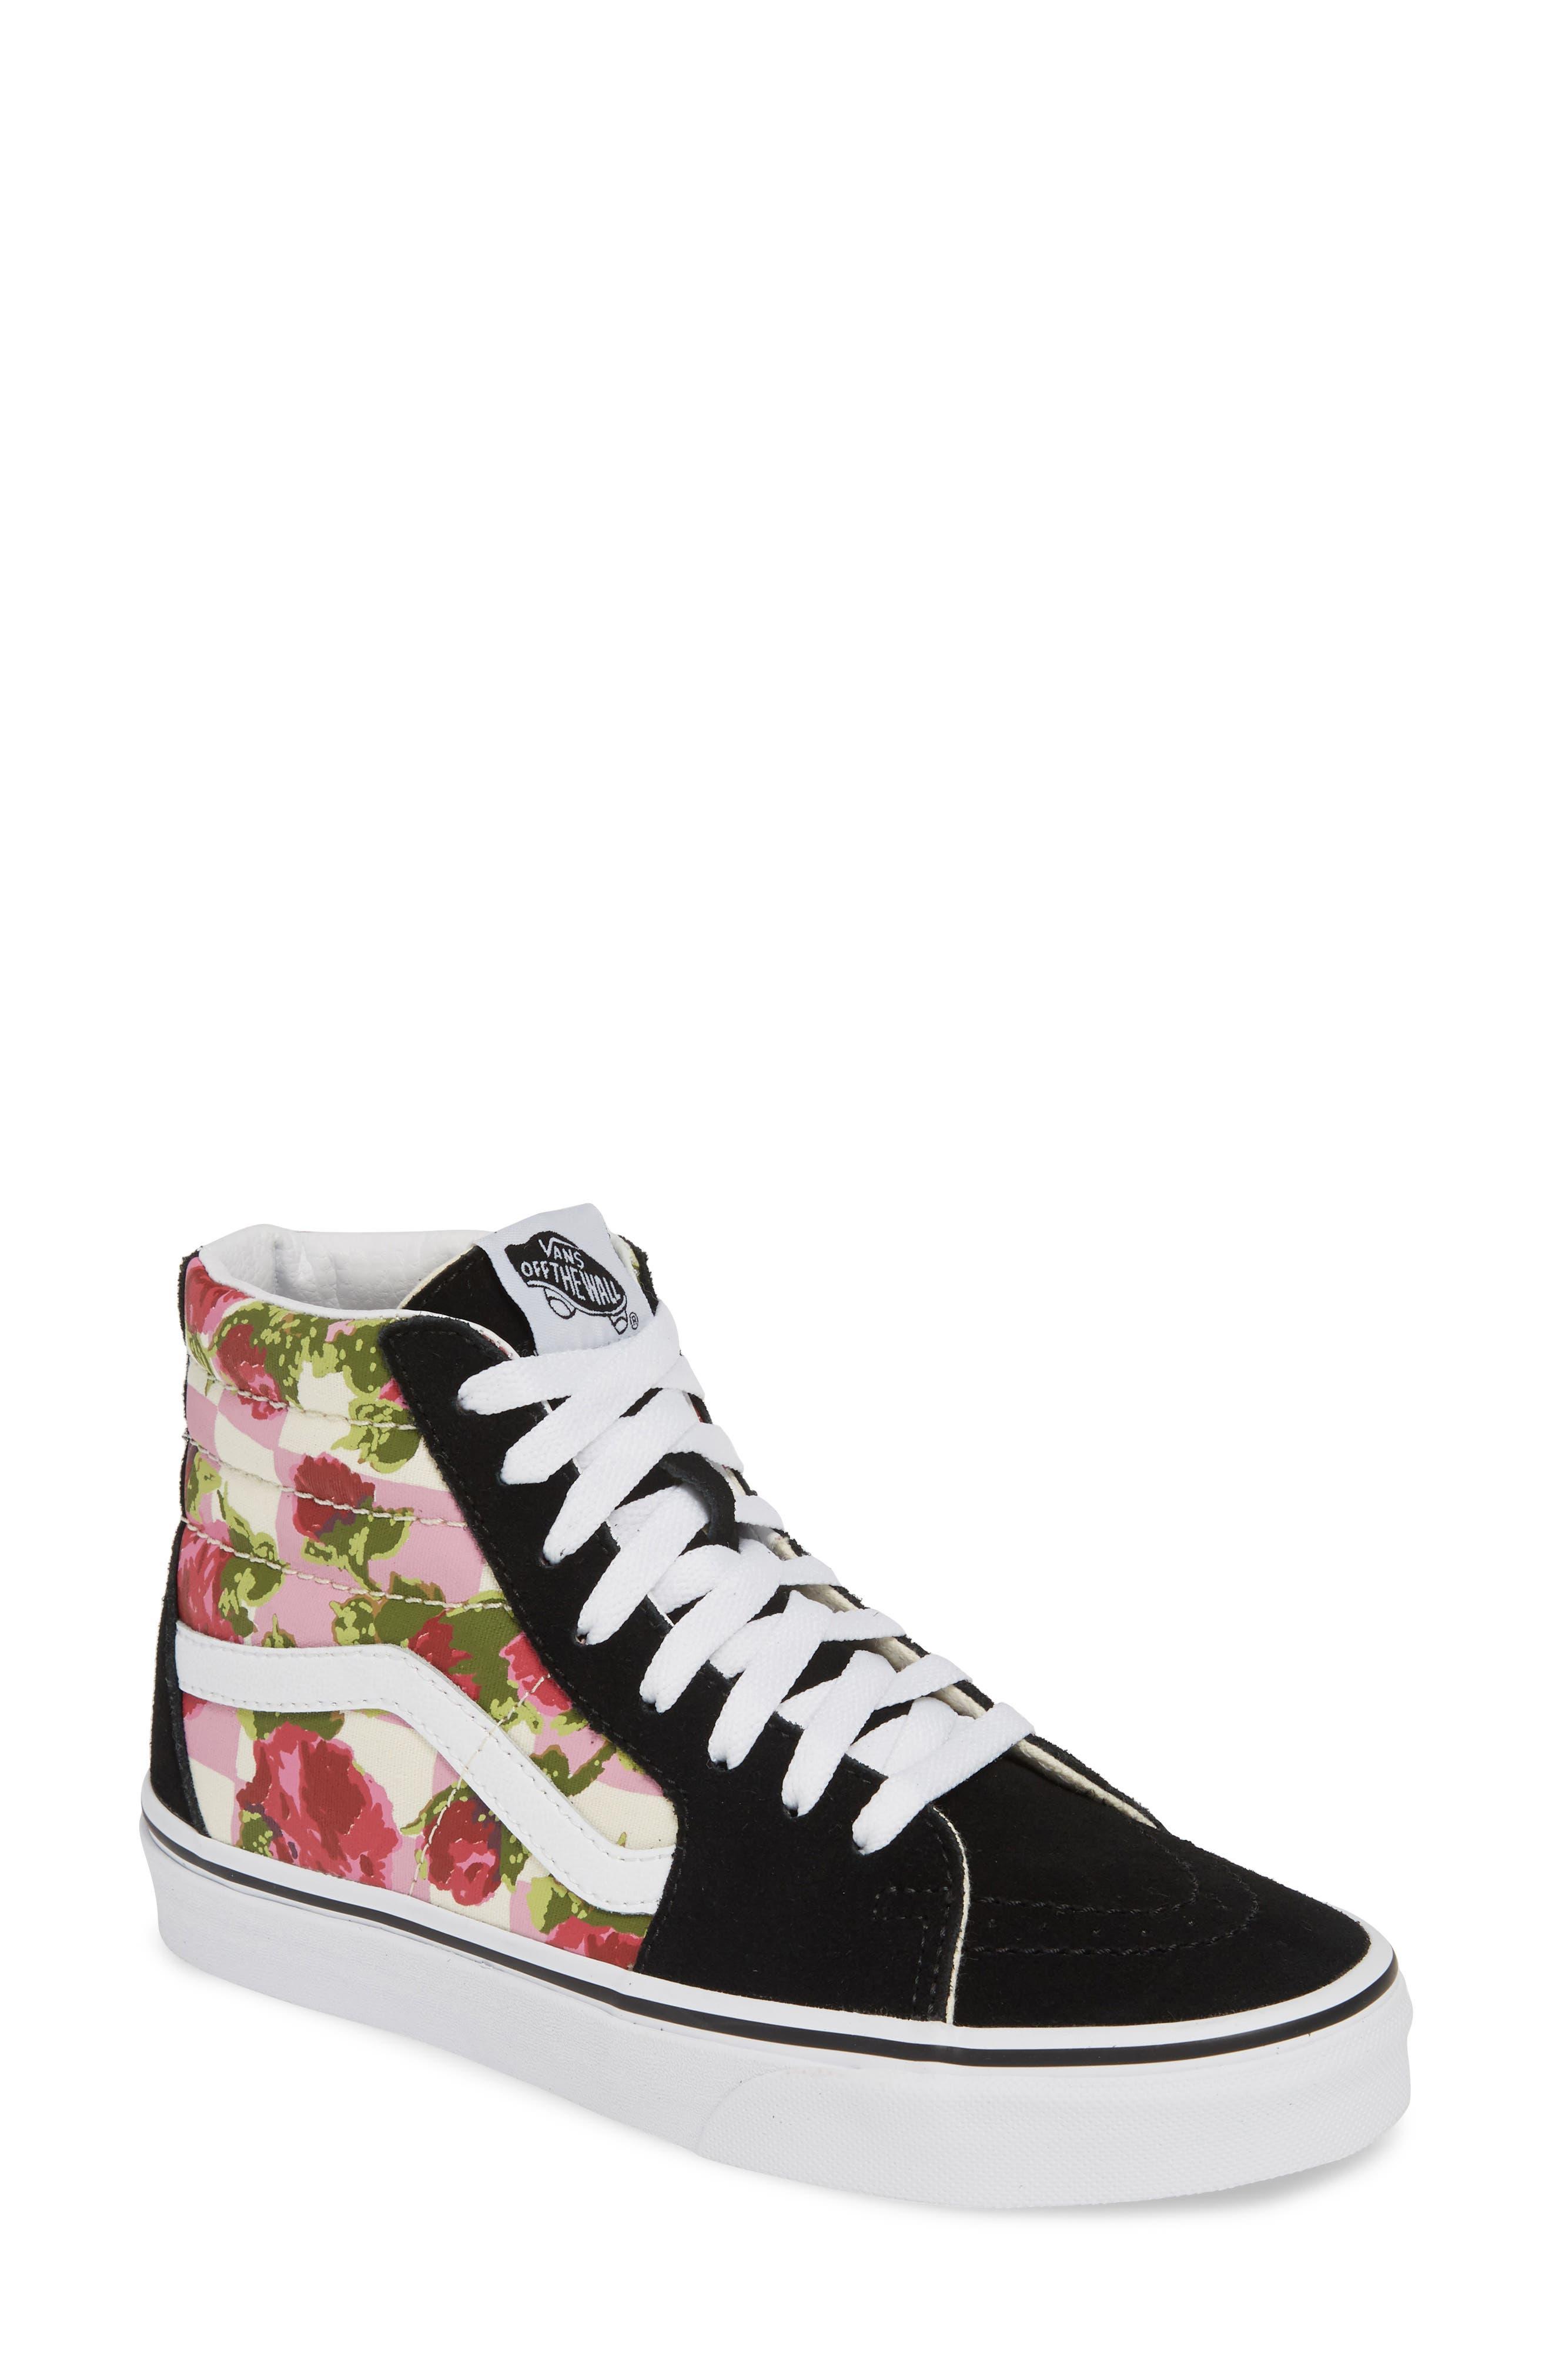 VANS Sk8-Hi Floral Sneaker, Main, color, FLORAL MULTI/ TRUE WHITE